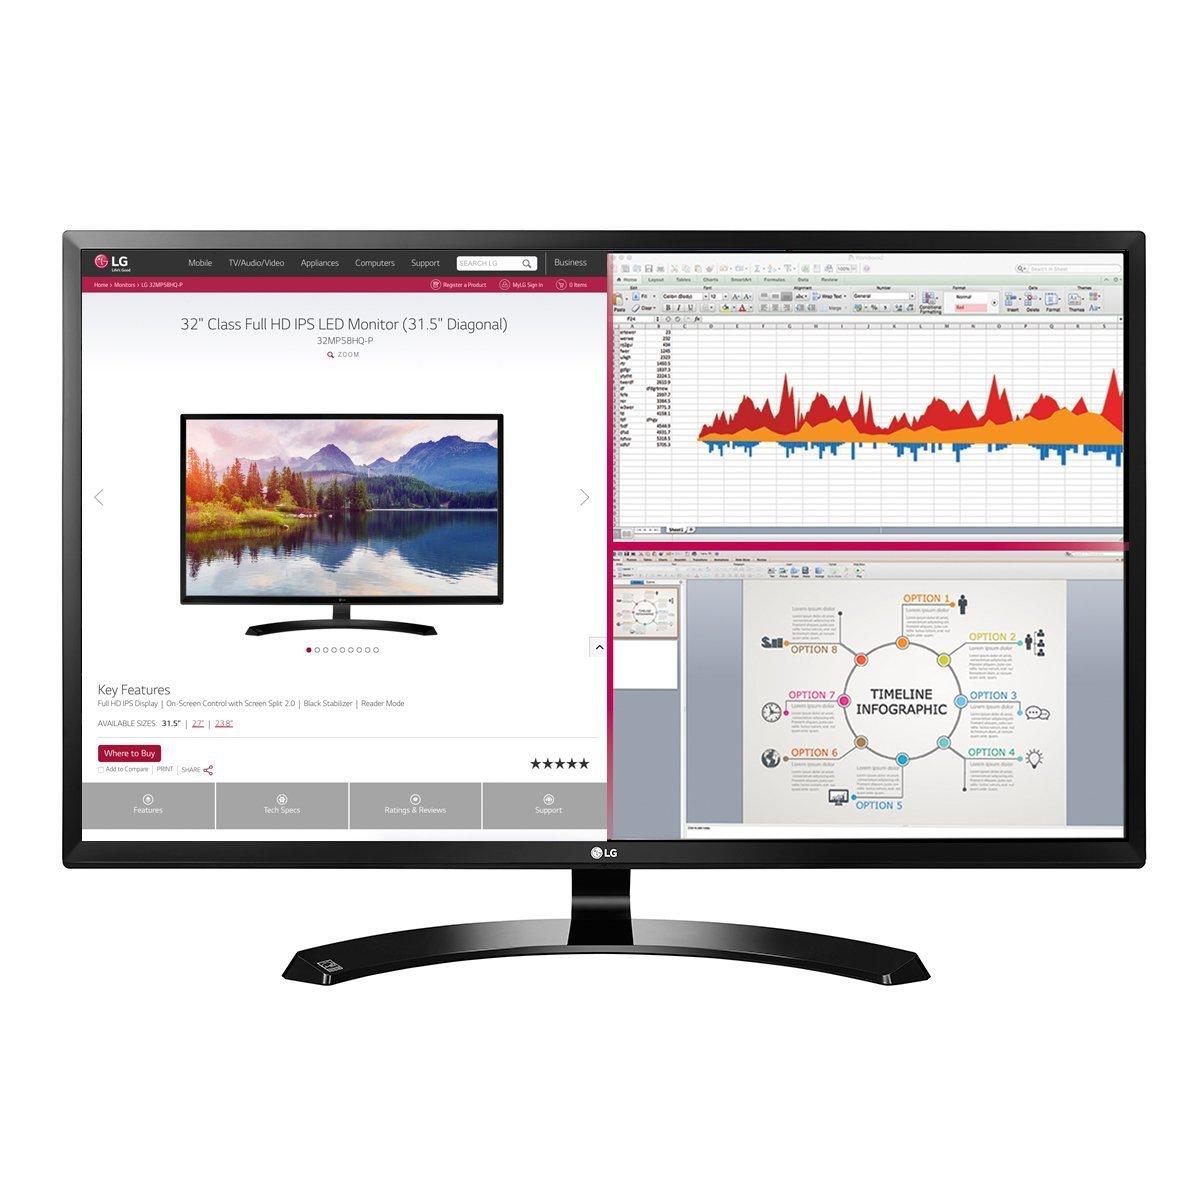 2018 LG Professional 32-Inch Full HD 1920 x 1080 IPS Monitor with HDMI, Display Port, D-Sub, On-Screen Control, Screen Split 2.0, Reader Mode, VESA Wall-Mount, Black by LG